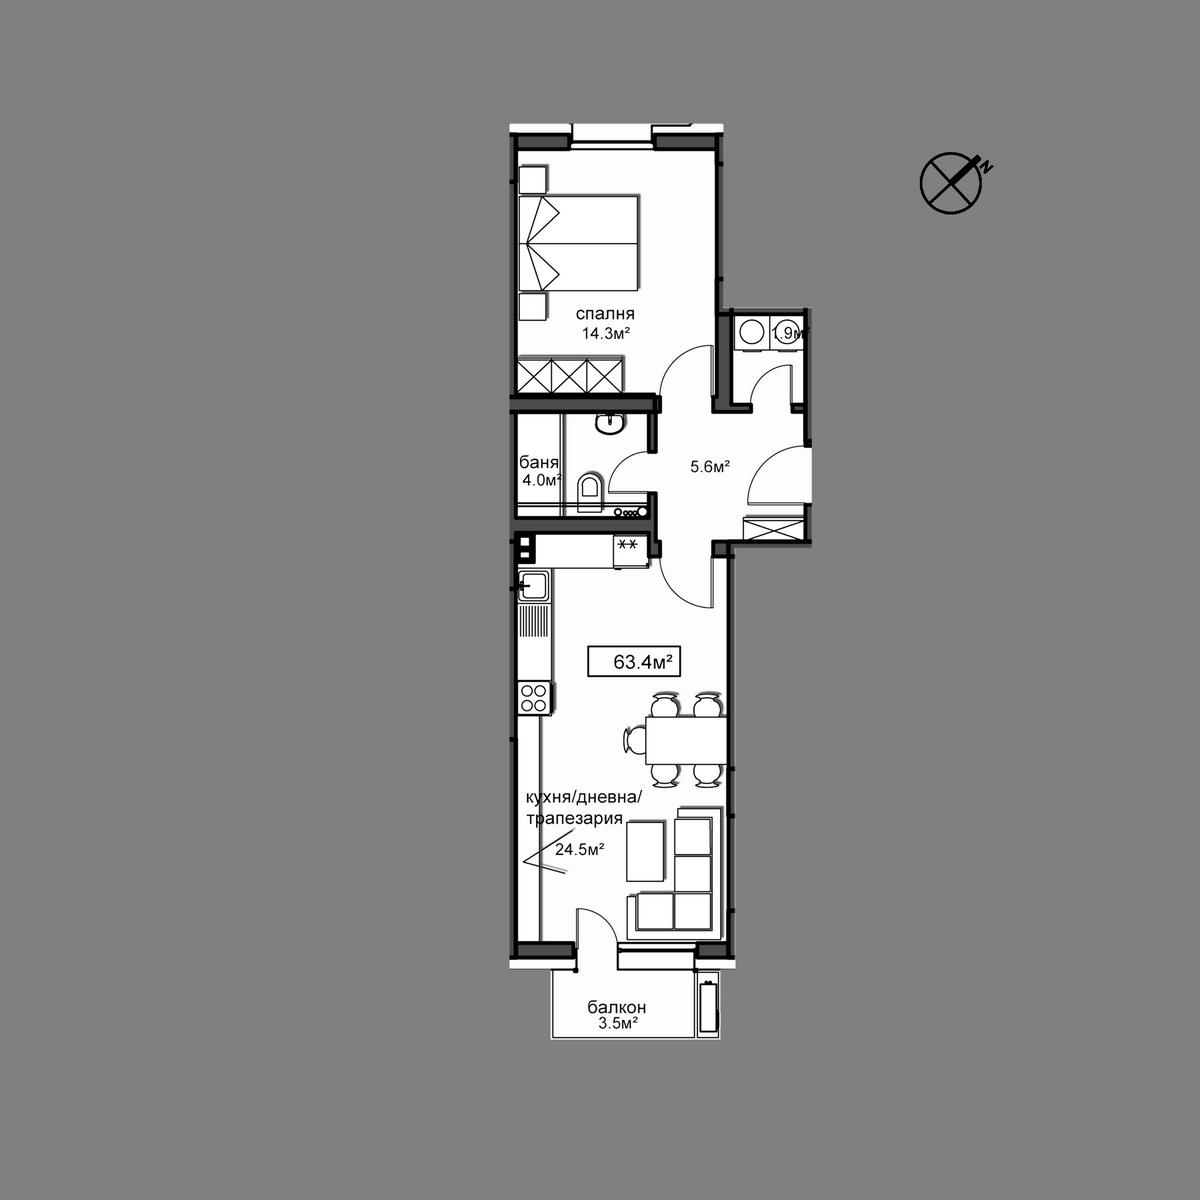 Апартамент Б3